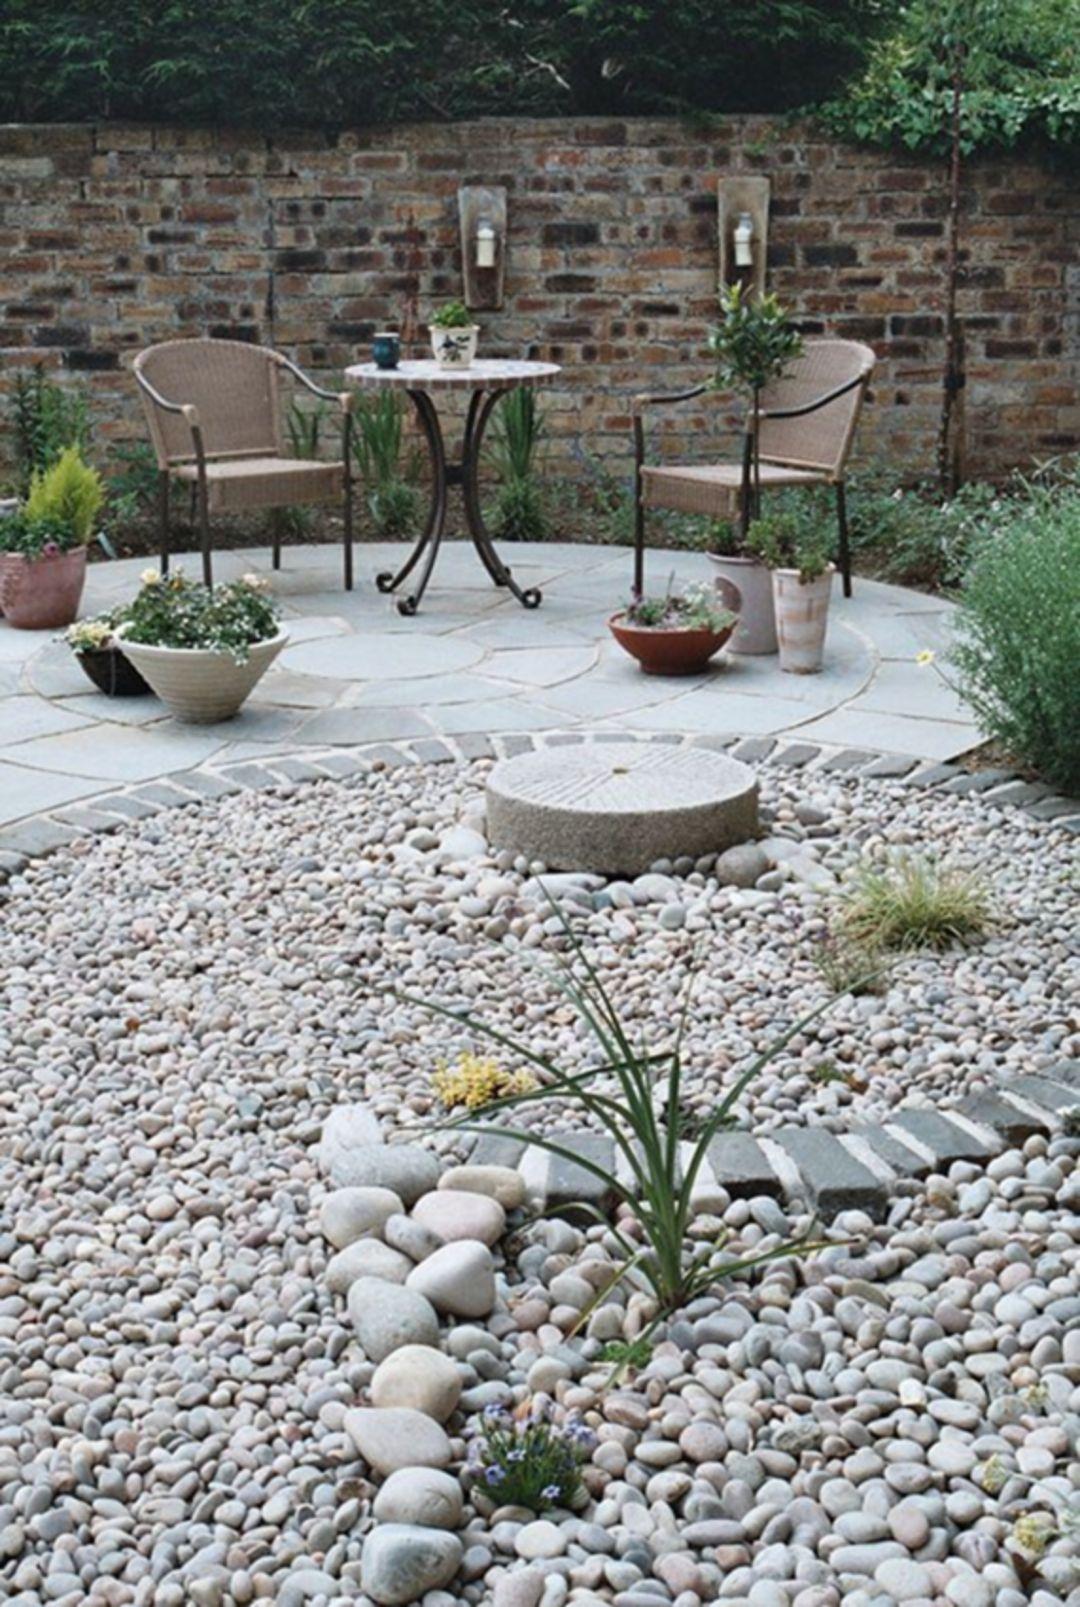 Inspiring 20 Gorgeous Zen Garden Design Ideas For ...